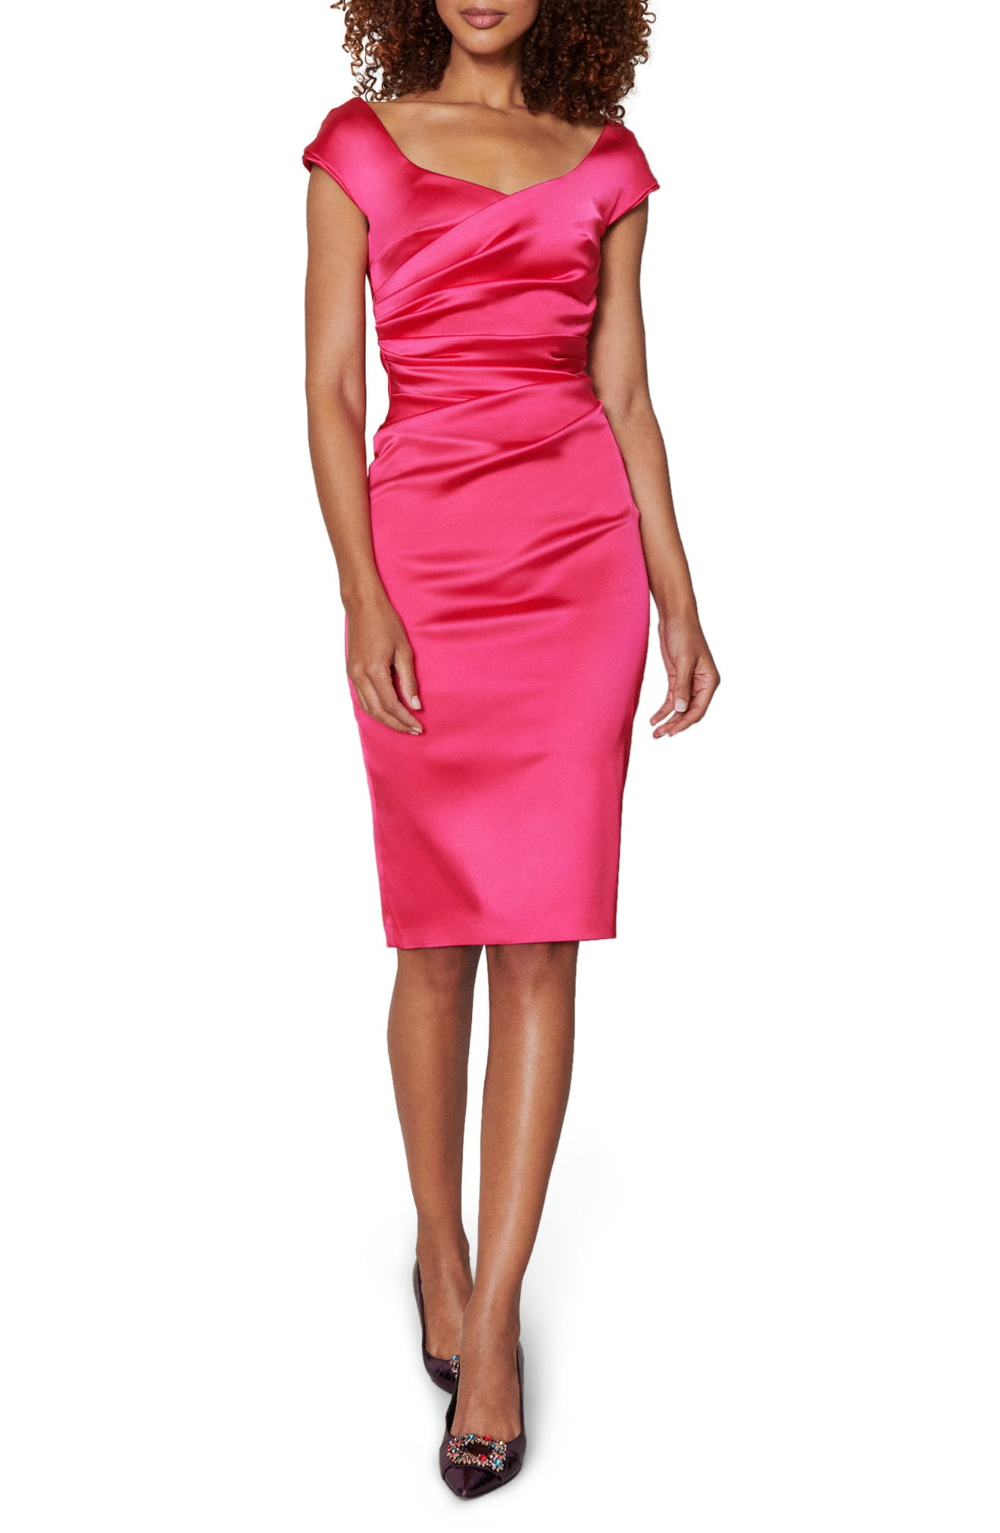 Talbot Runhof Stretch Satin Duchesse Cocktail Dress We Select Dresses In 2020 Silky Dress Dresses Select Dress [ 1533 x 1000 Pixel ]